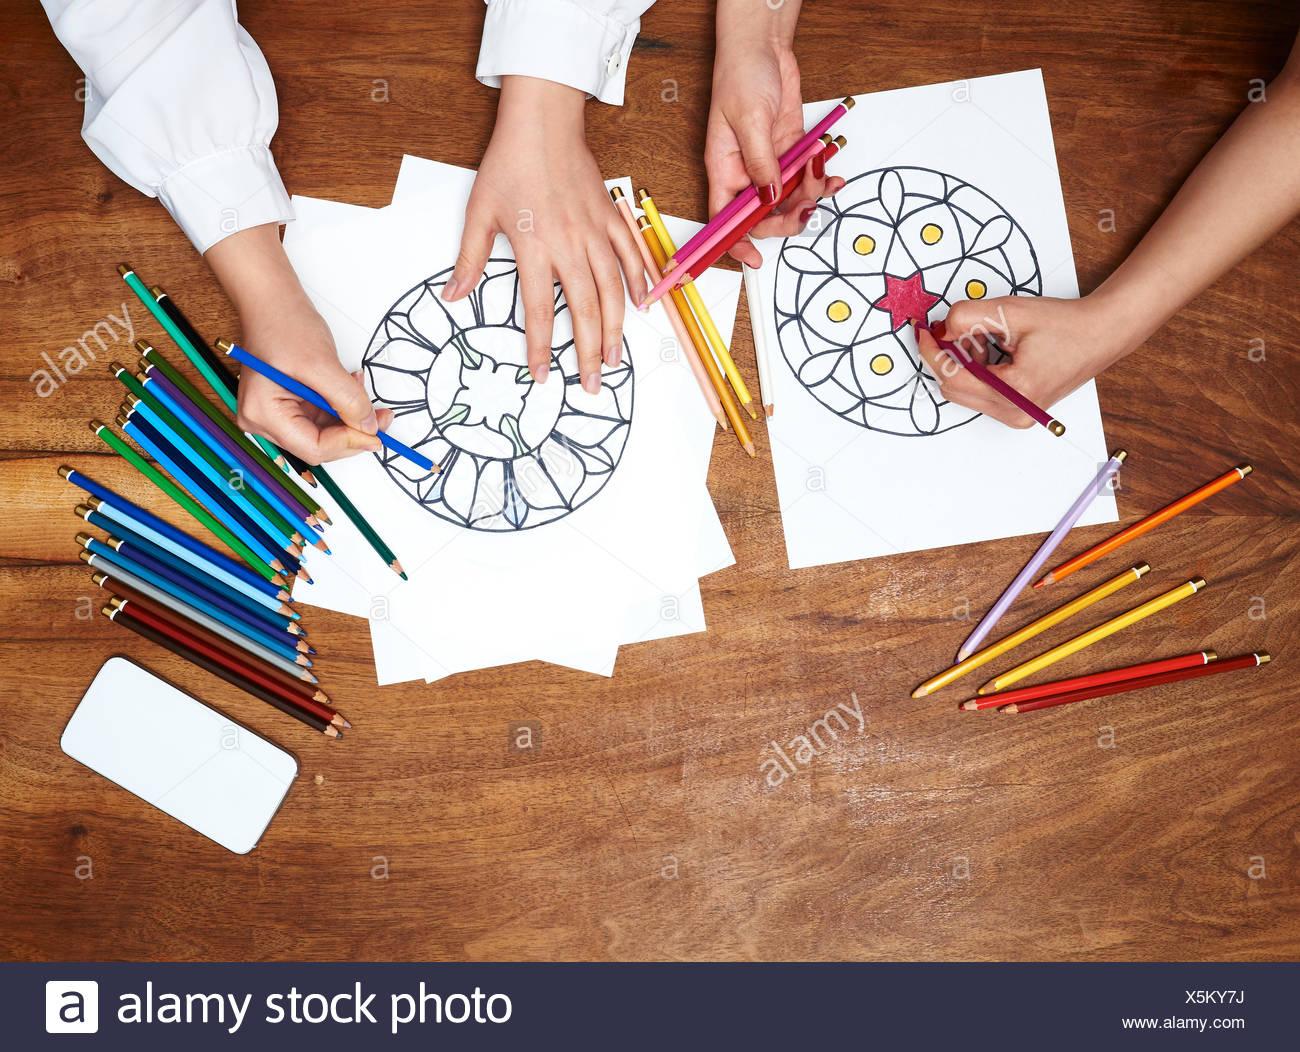 Hands drawing mandalas - Stock Image